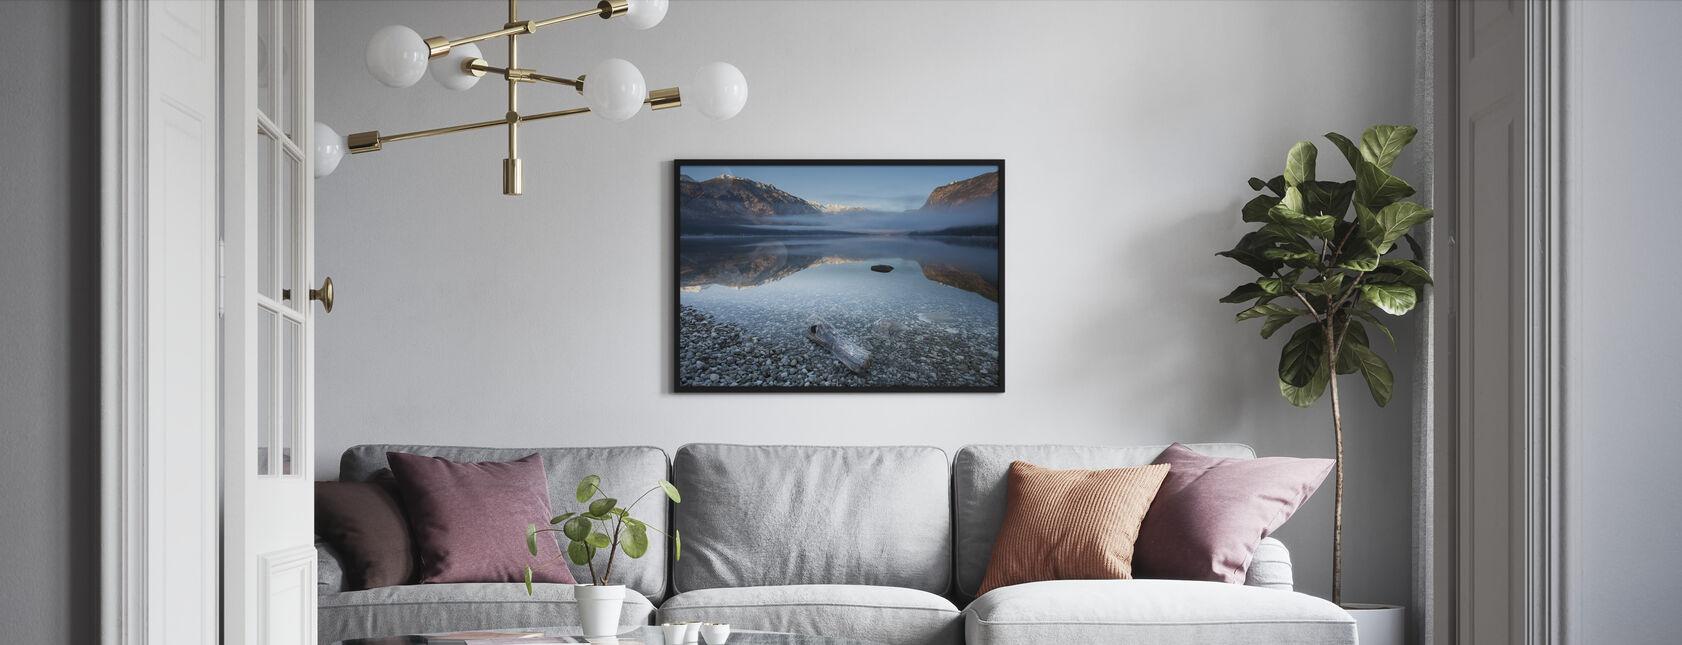 Bohinj's Tranquility - Framed print - Living Room